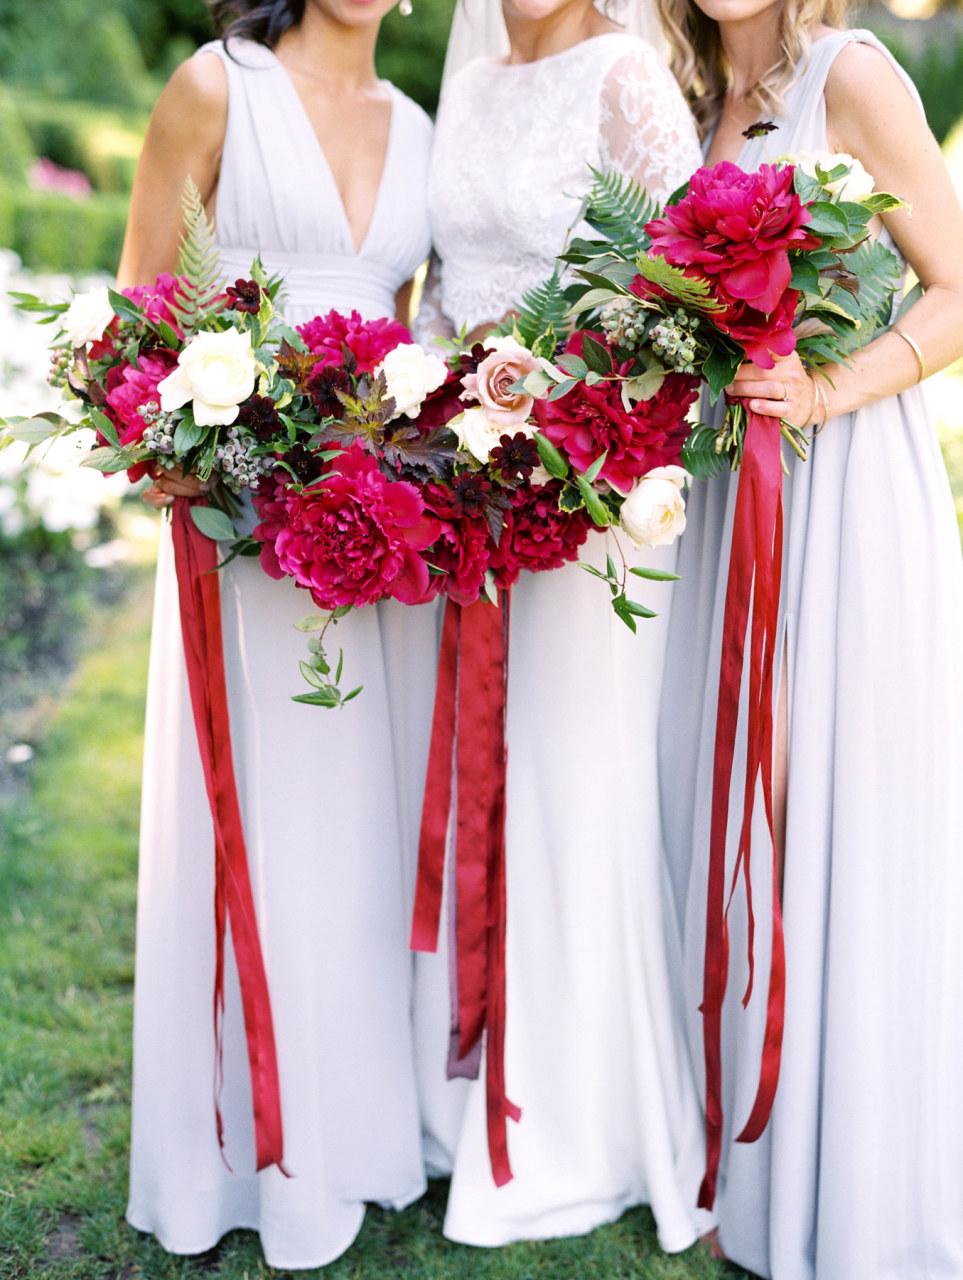 fine-art-wedding-florist-foraged-floral-lewis-and-clark-college-wedding-red-peonies.jpg